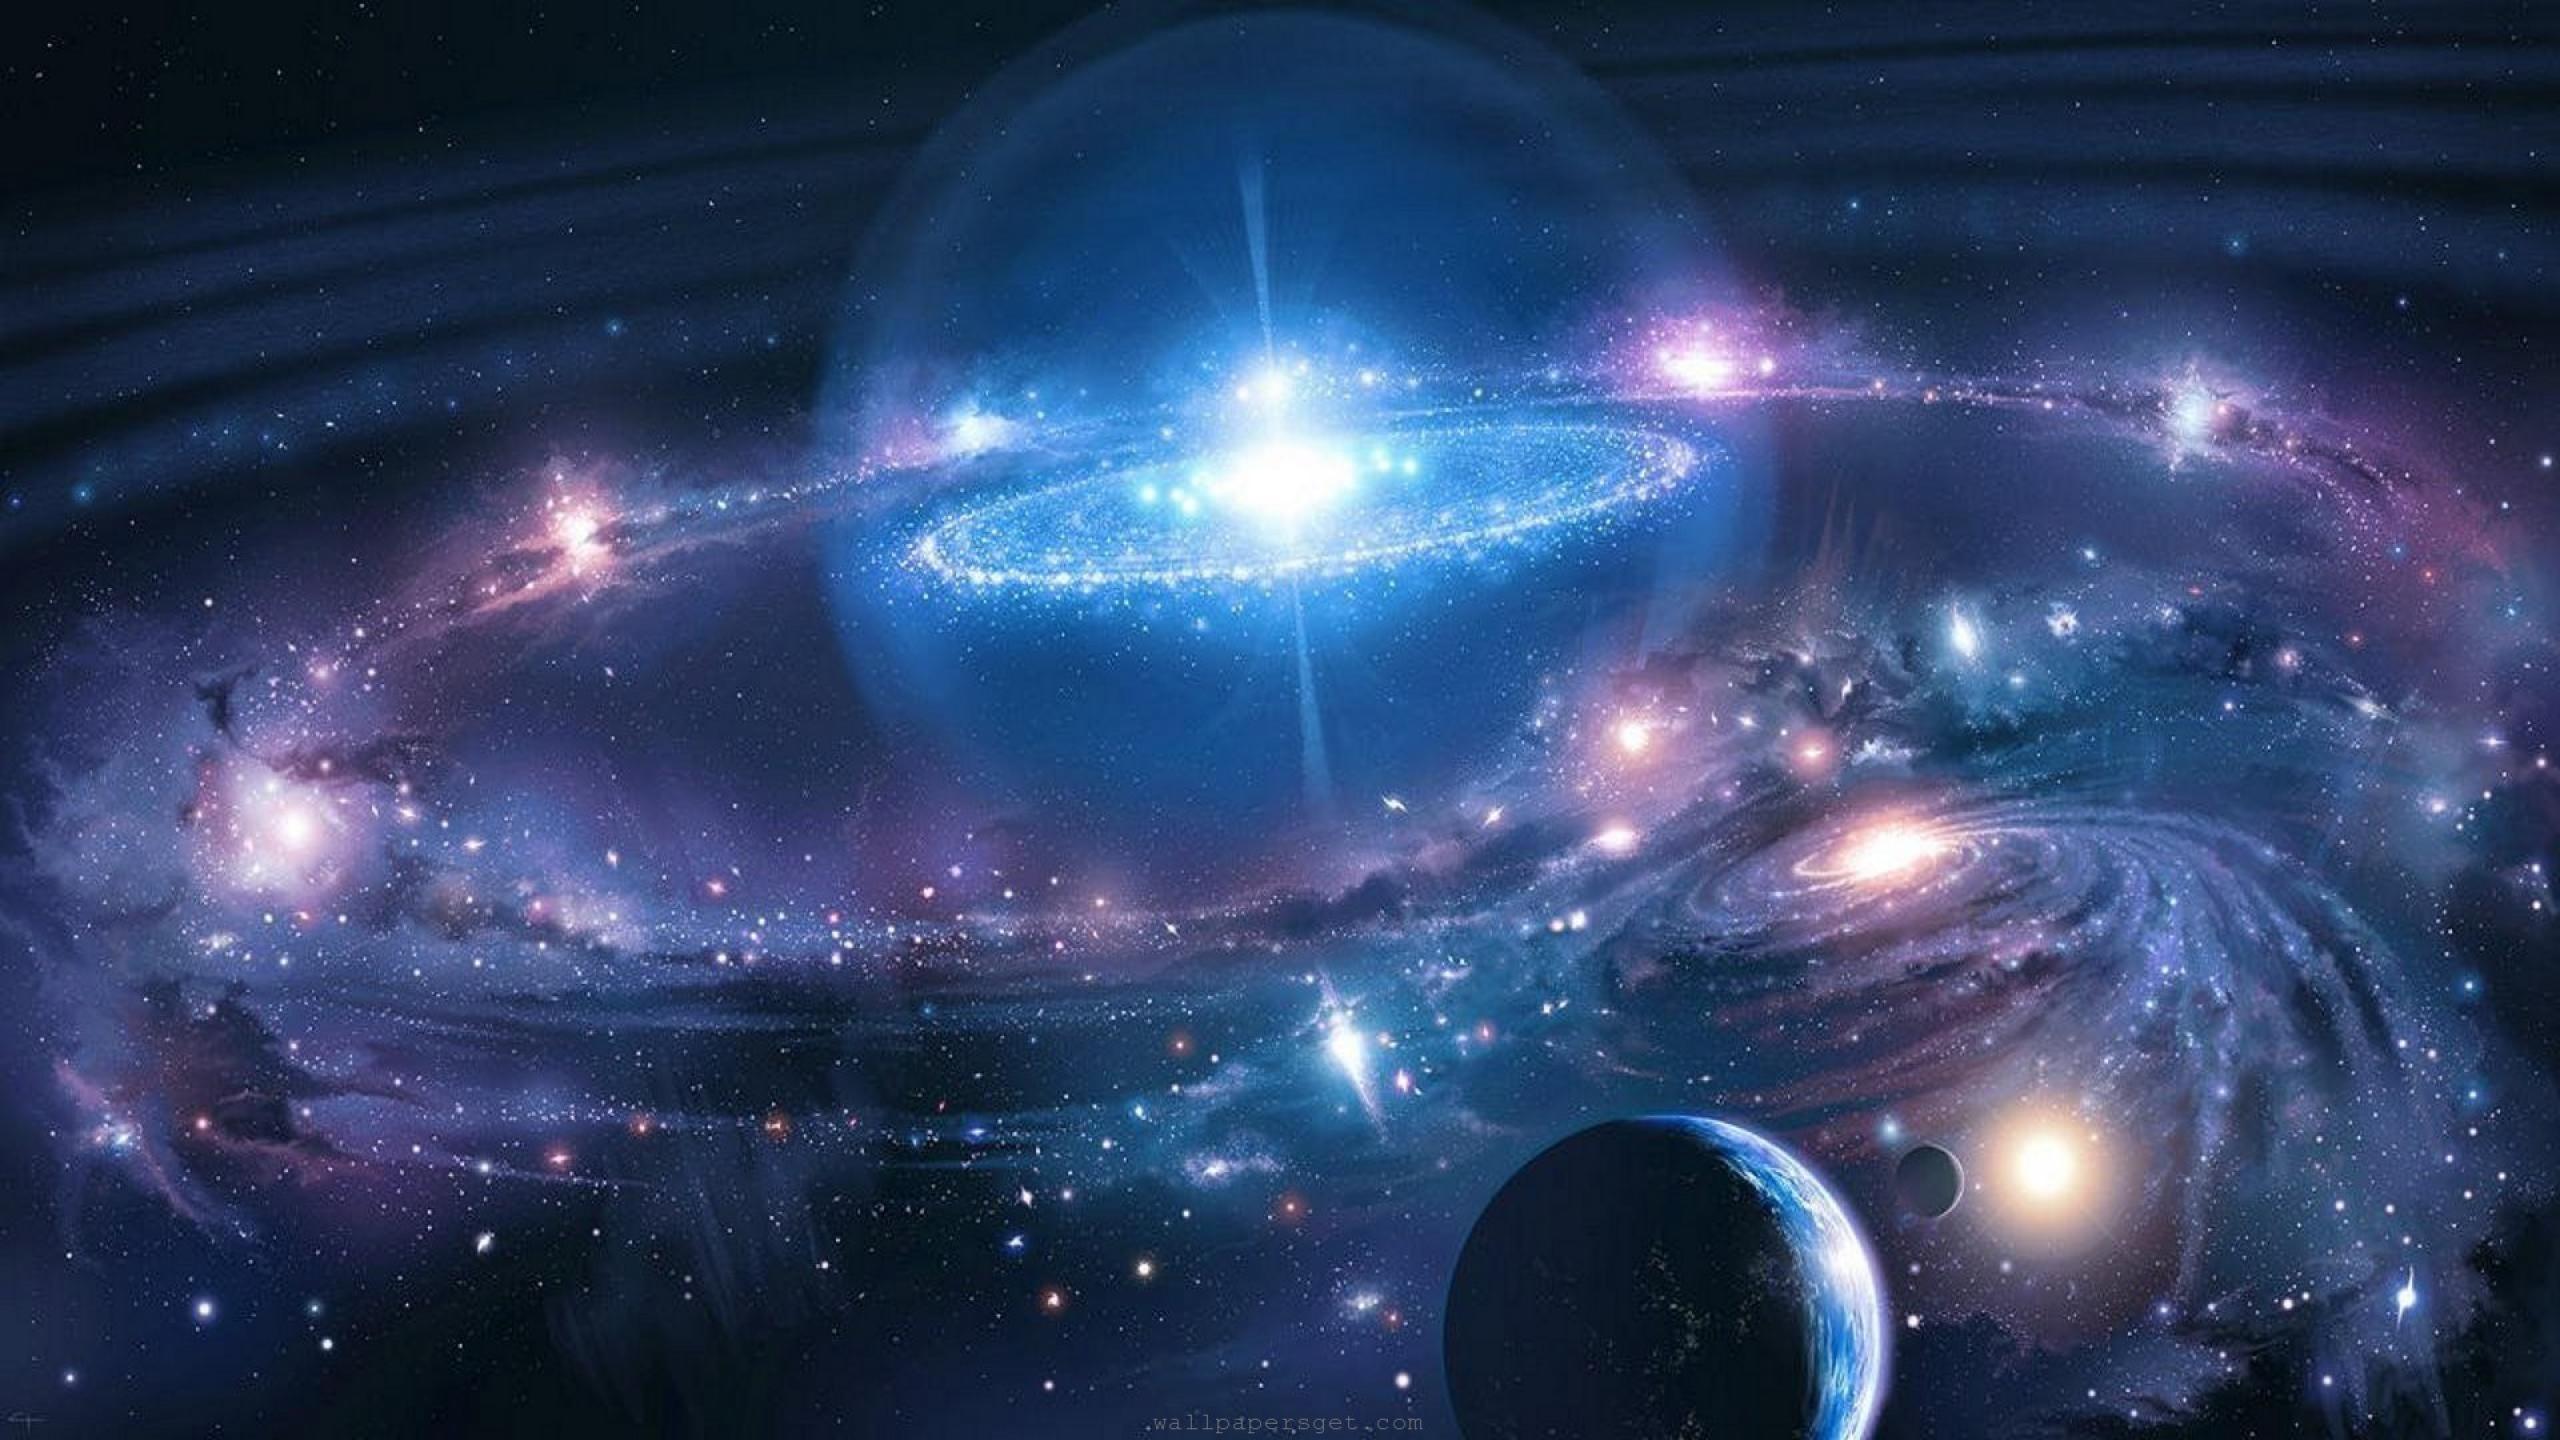 Cool HD Space Galaxy Wallpapers – WallpaperSafari